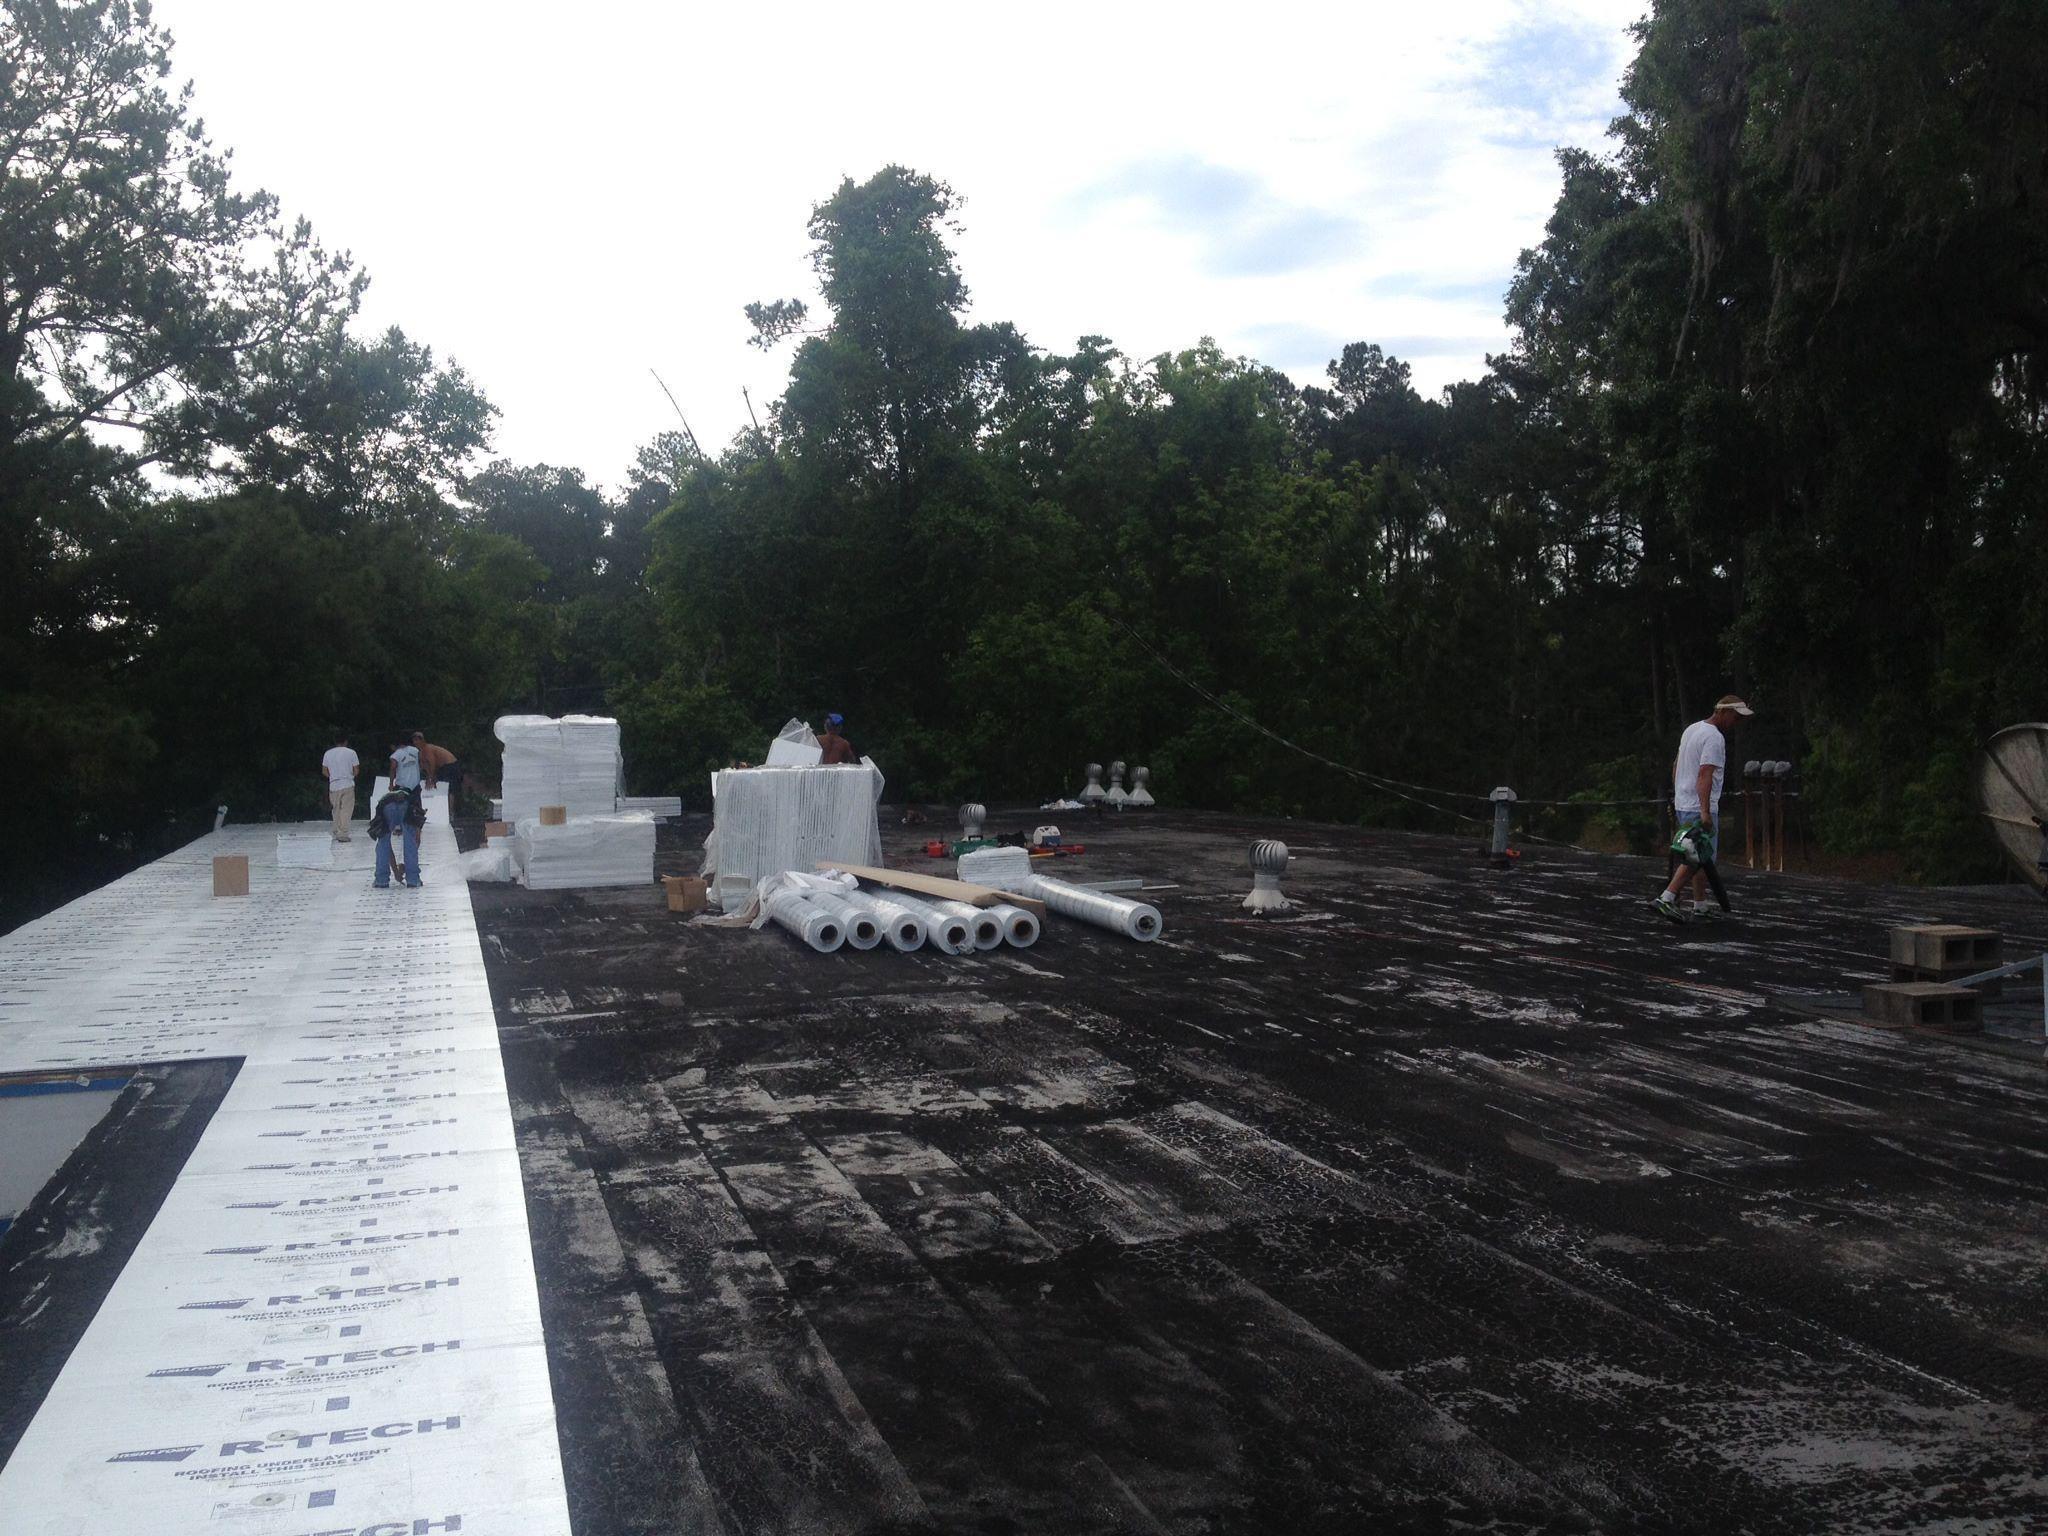 RoofCrafters-Savannah image 73